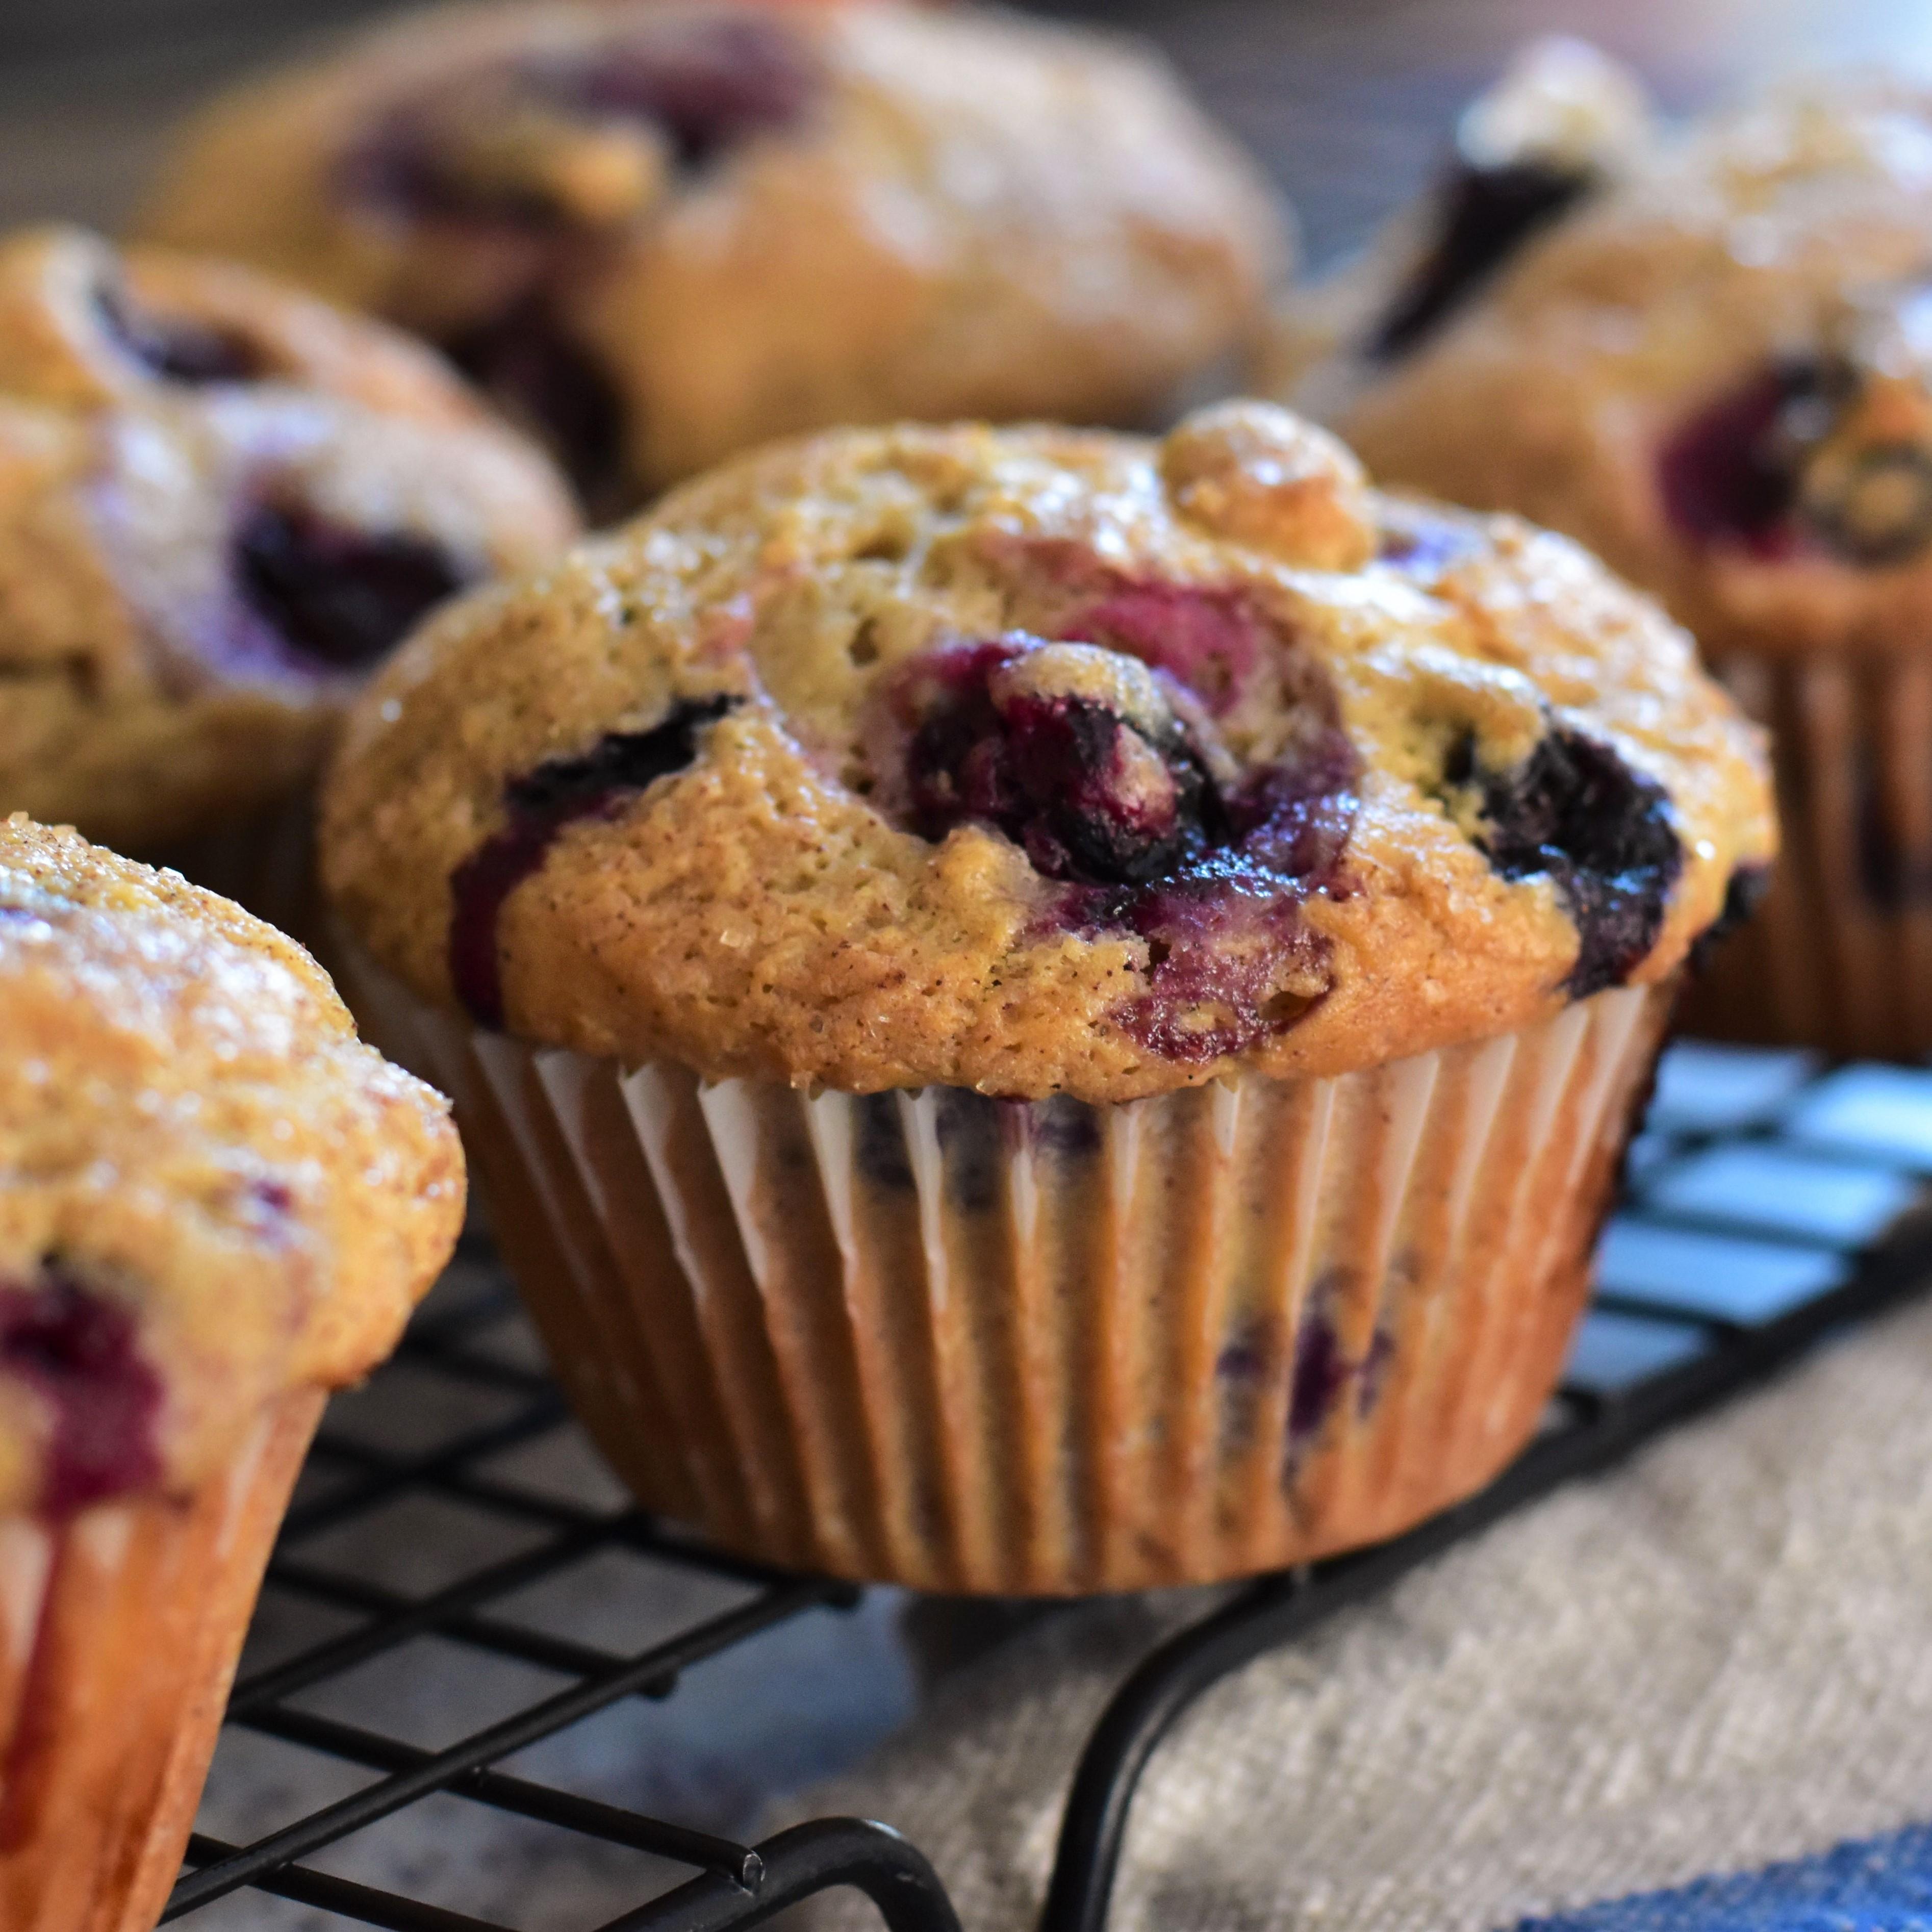 Make-Ahead Blueberry-Cinnamon Muffins